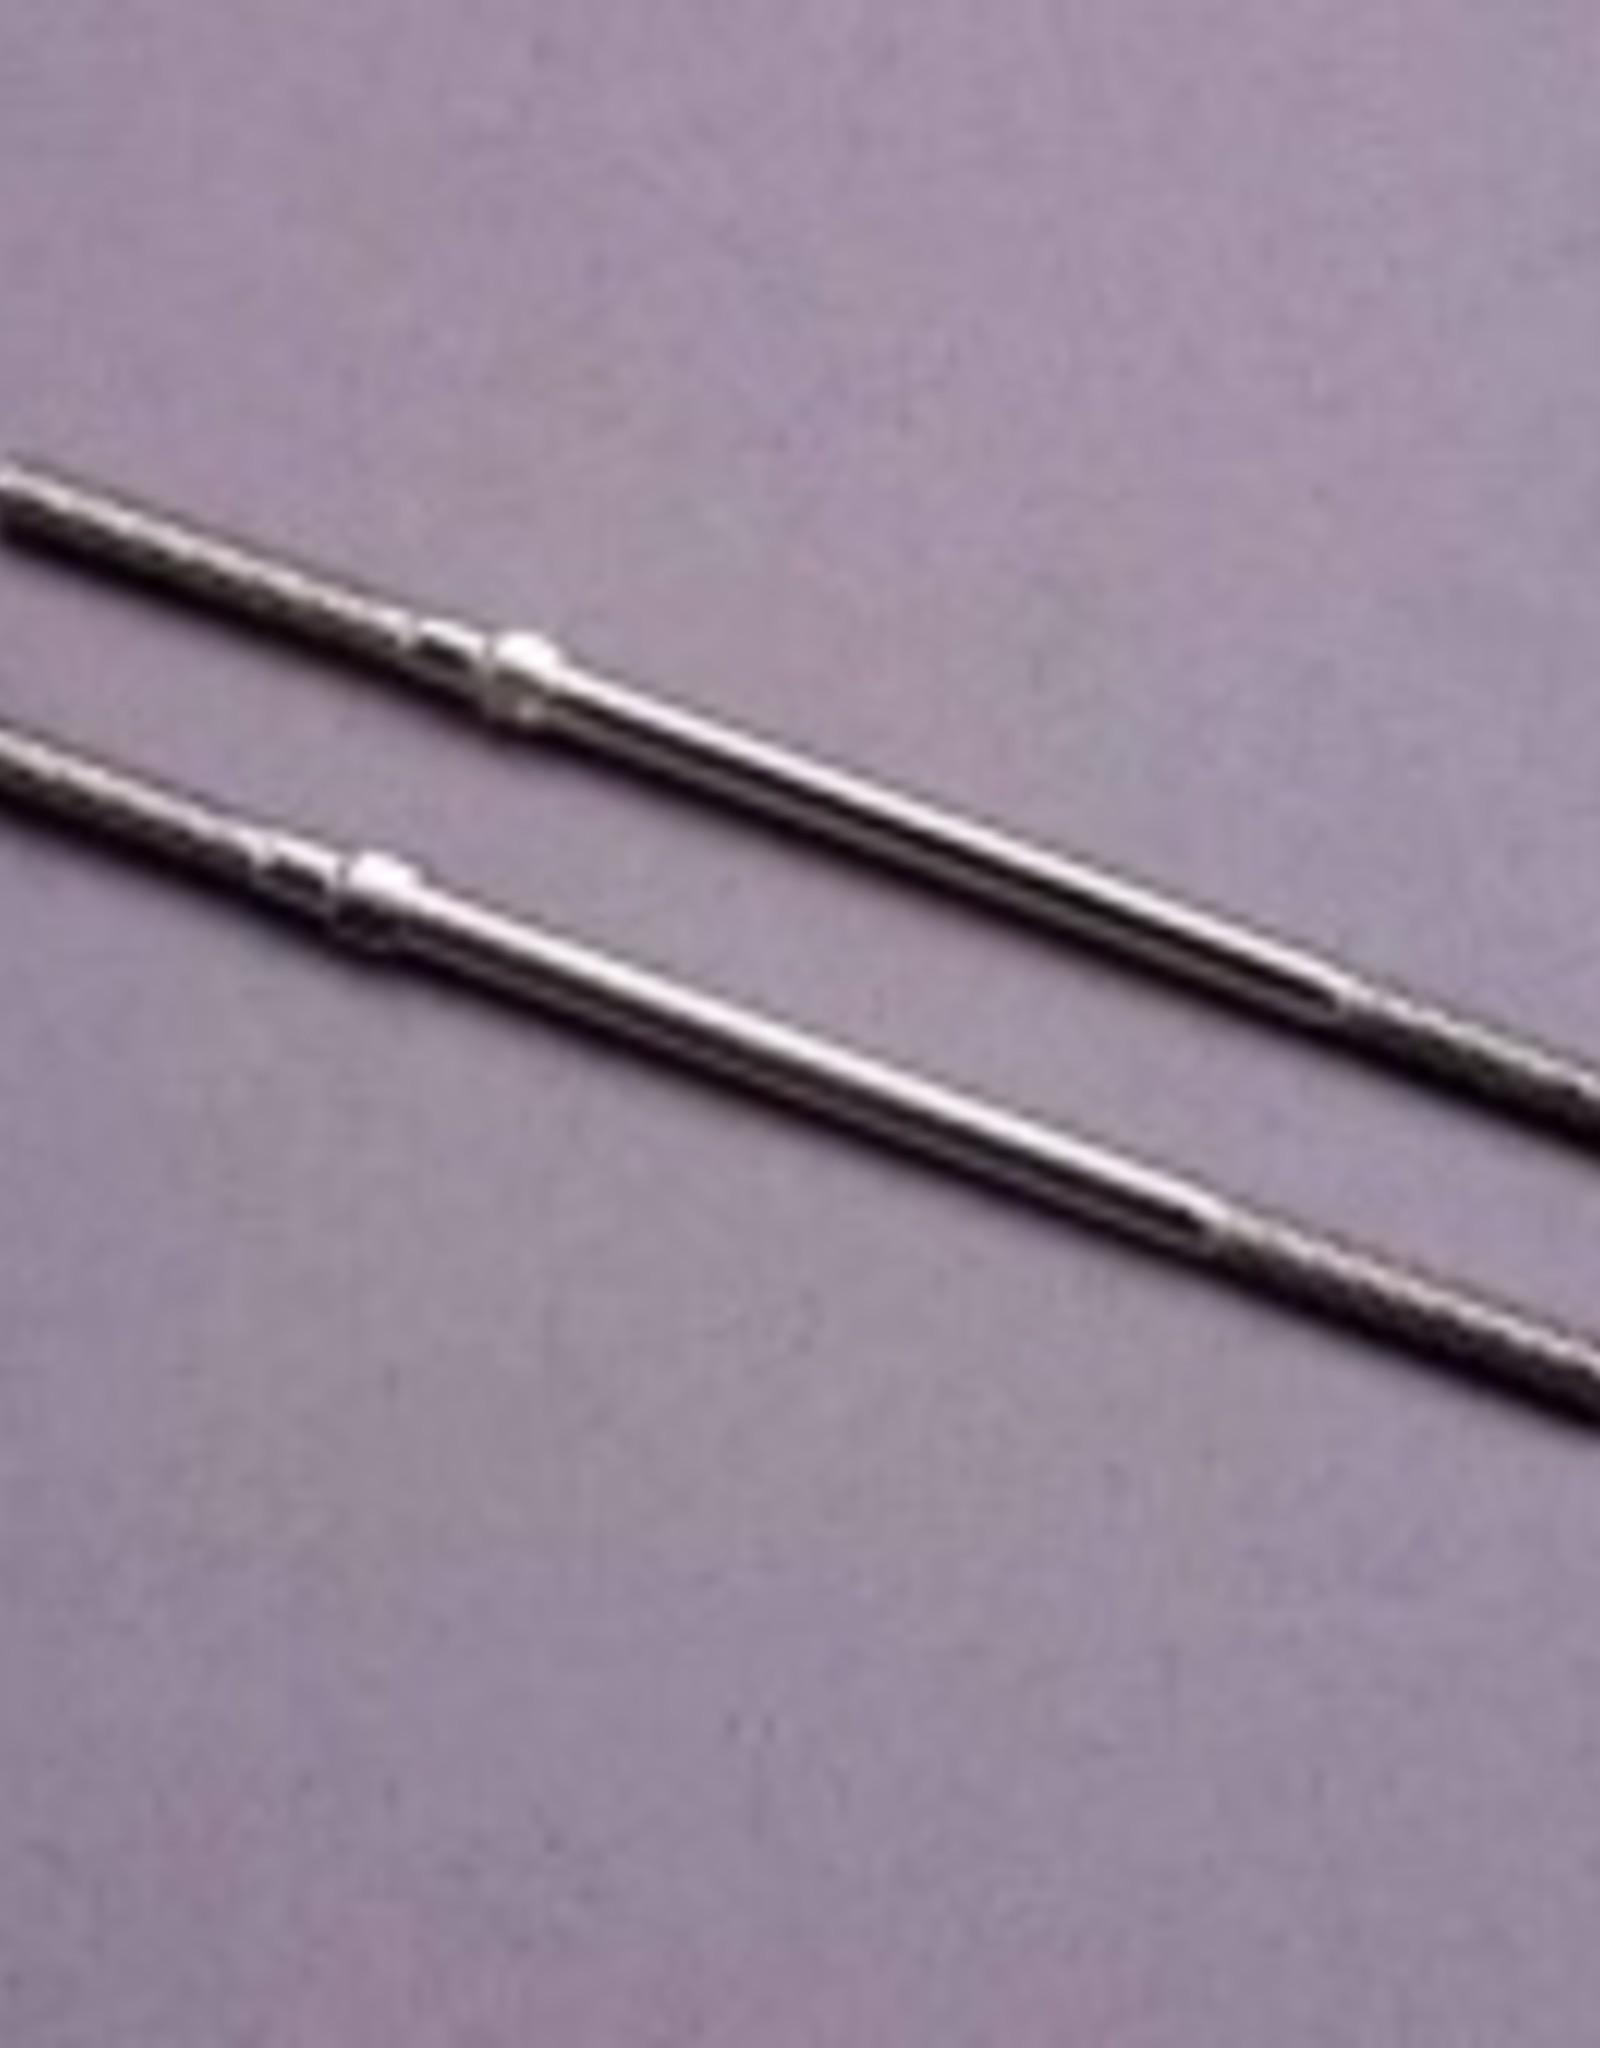 Traxxas Turnbuckles, 78mm (2)